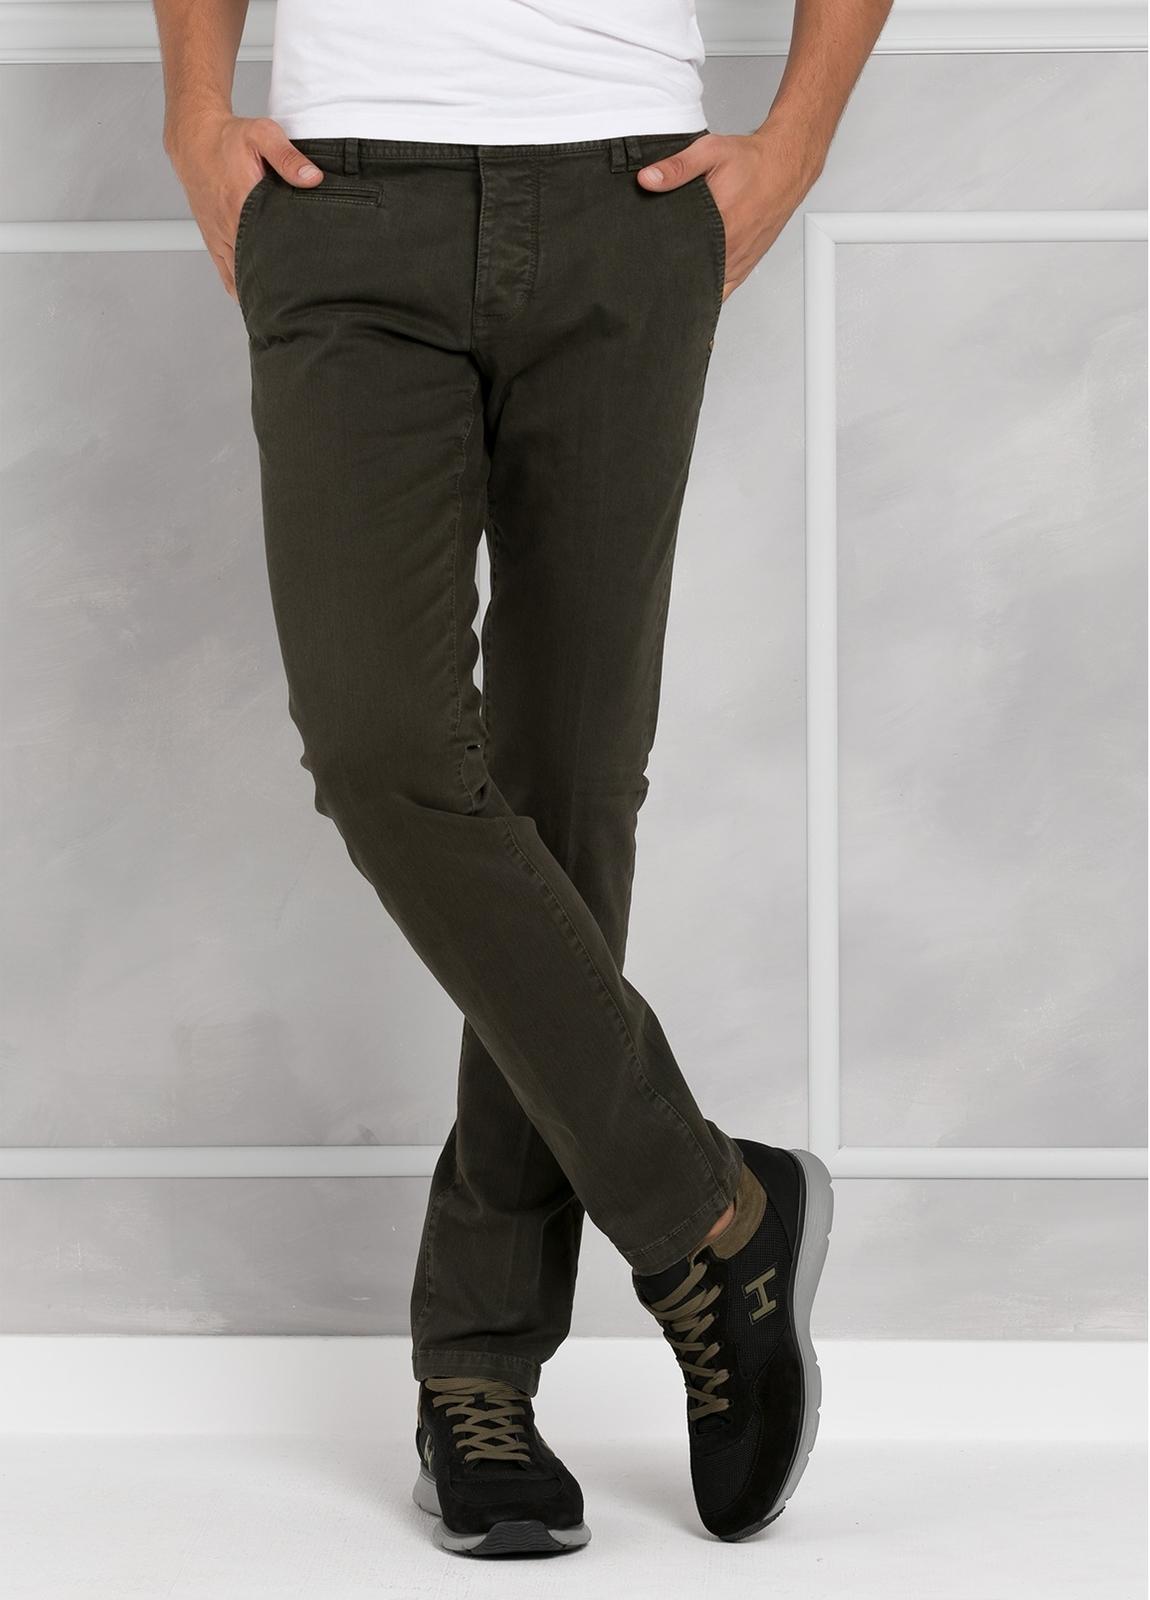 Pantalón 5 bolsillos modelo BRAD 01 color kaki. 97% Algodón 3% Elastán.